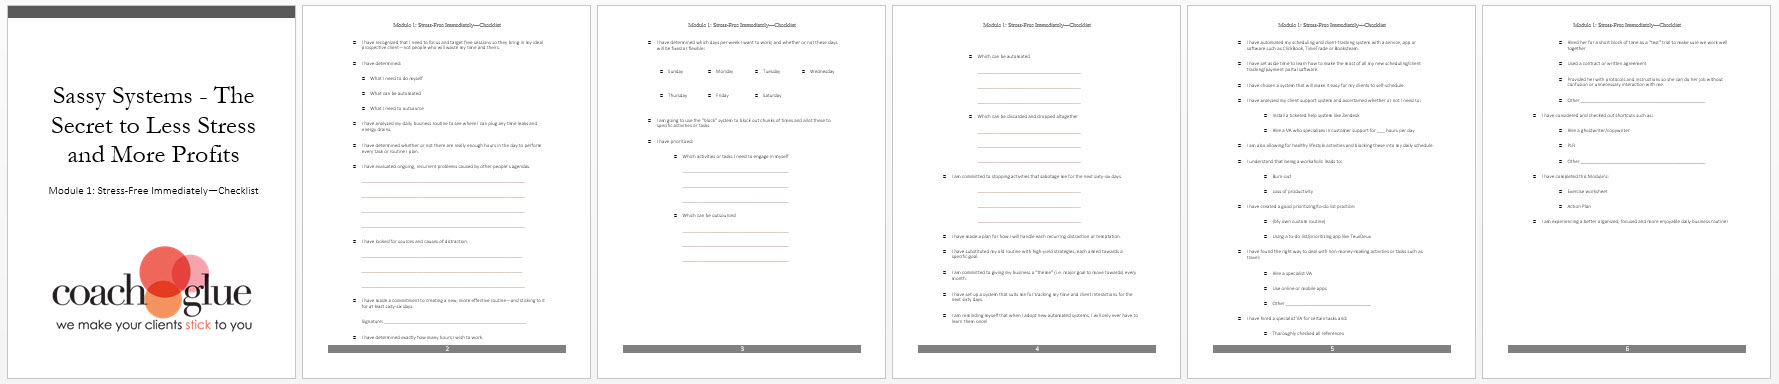 Module 1 Stress Free Immediately Checklist Screenshot